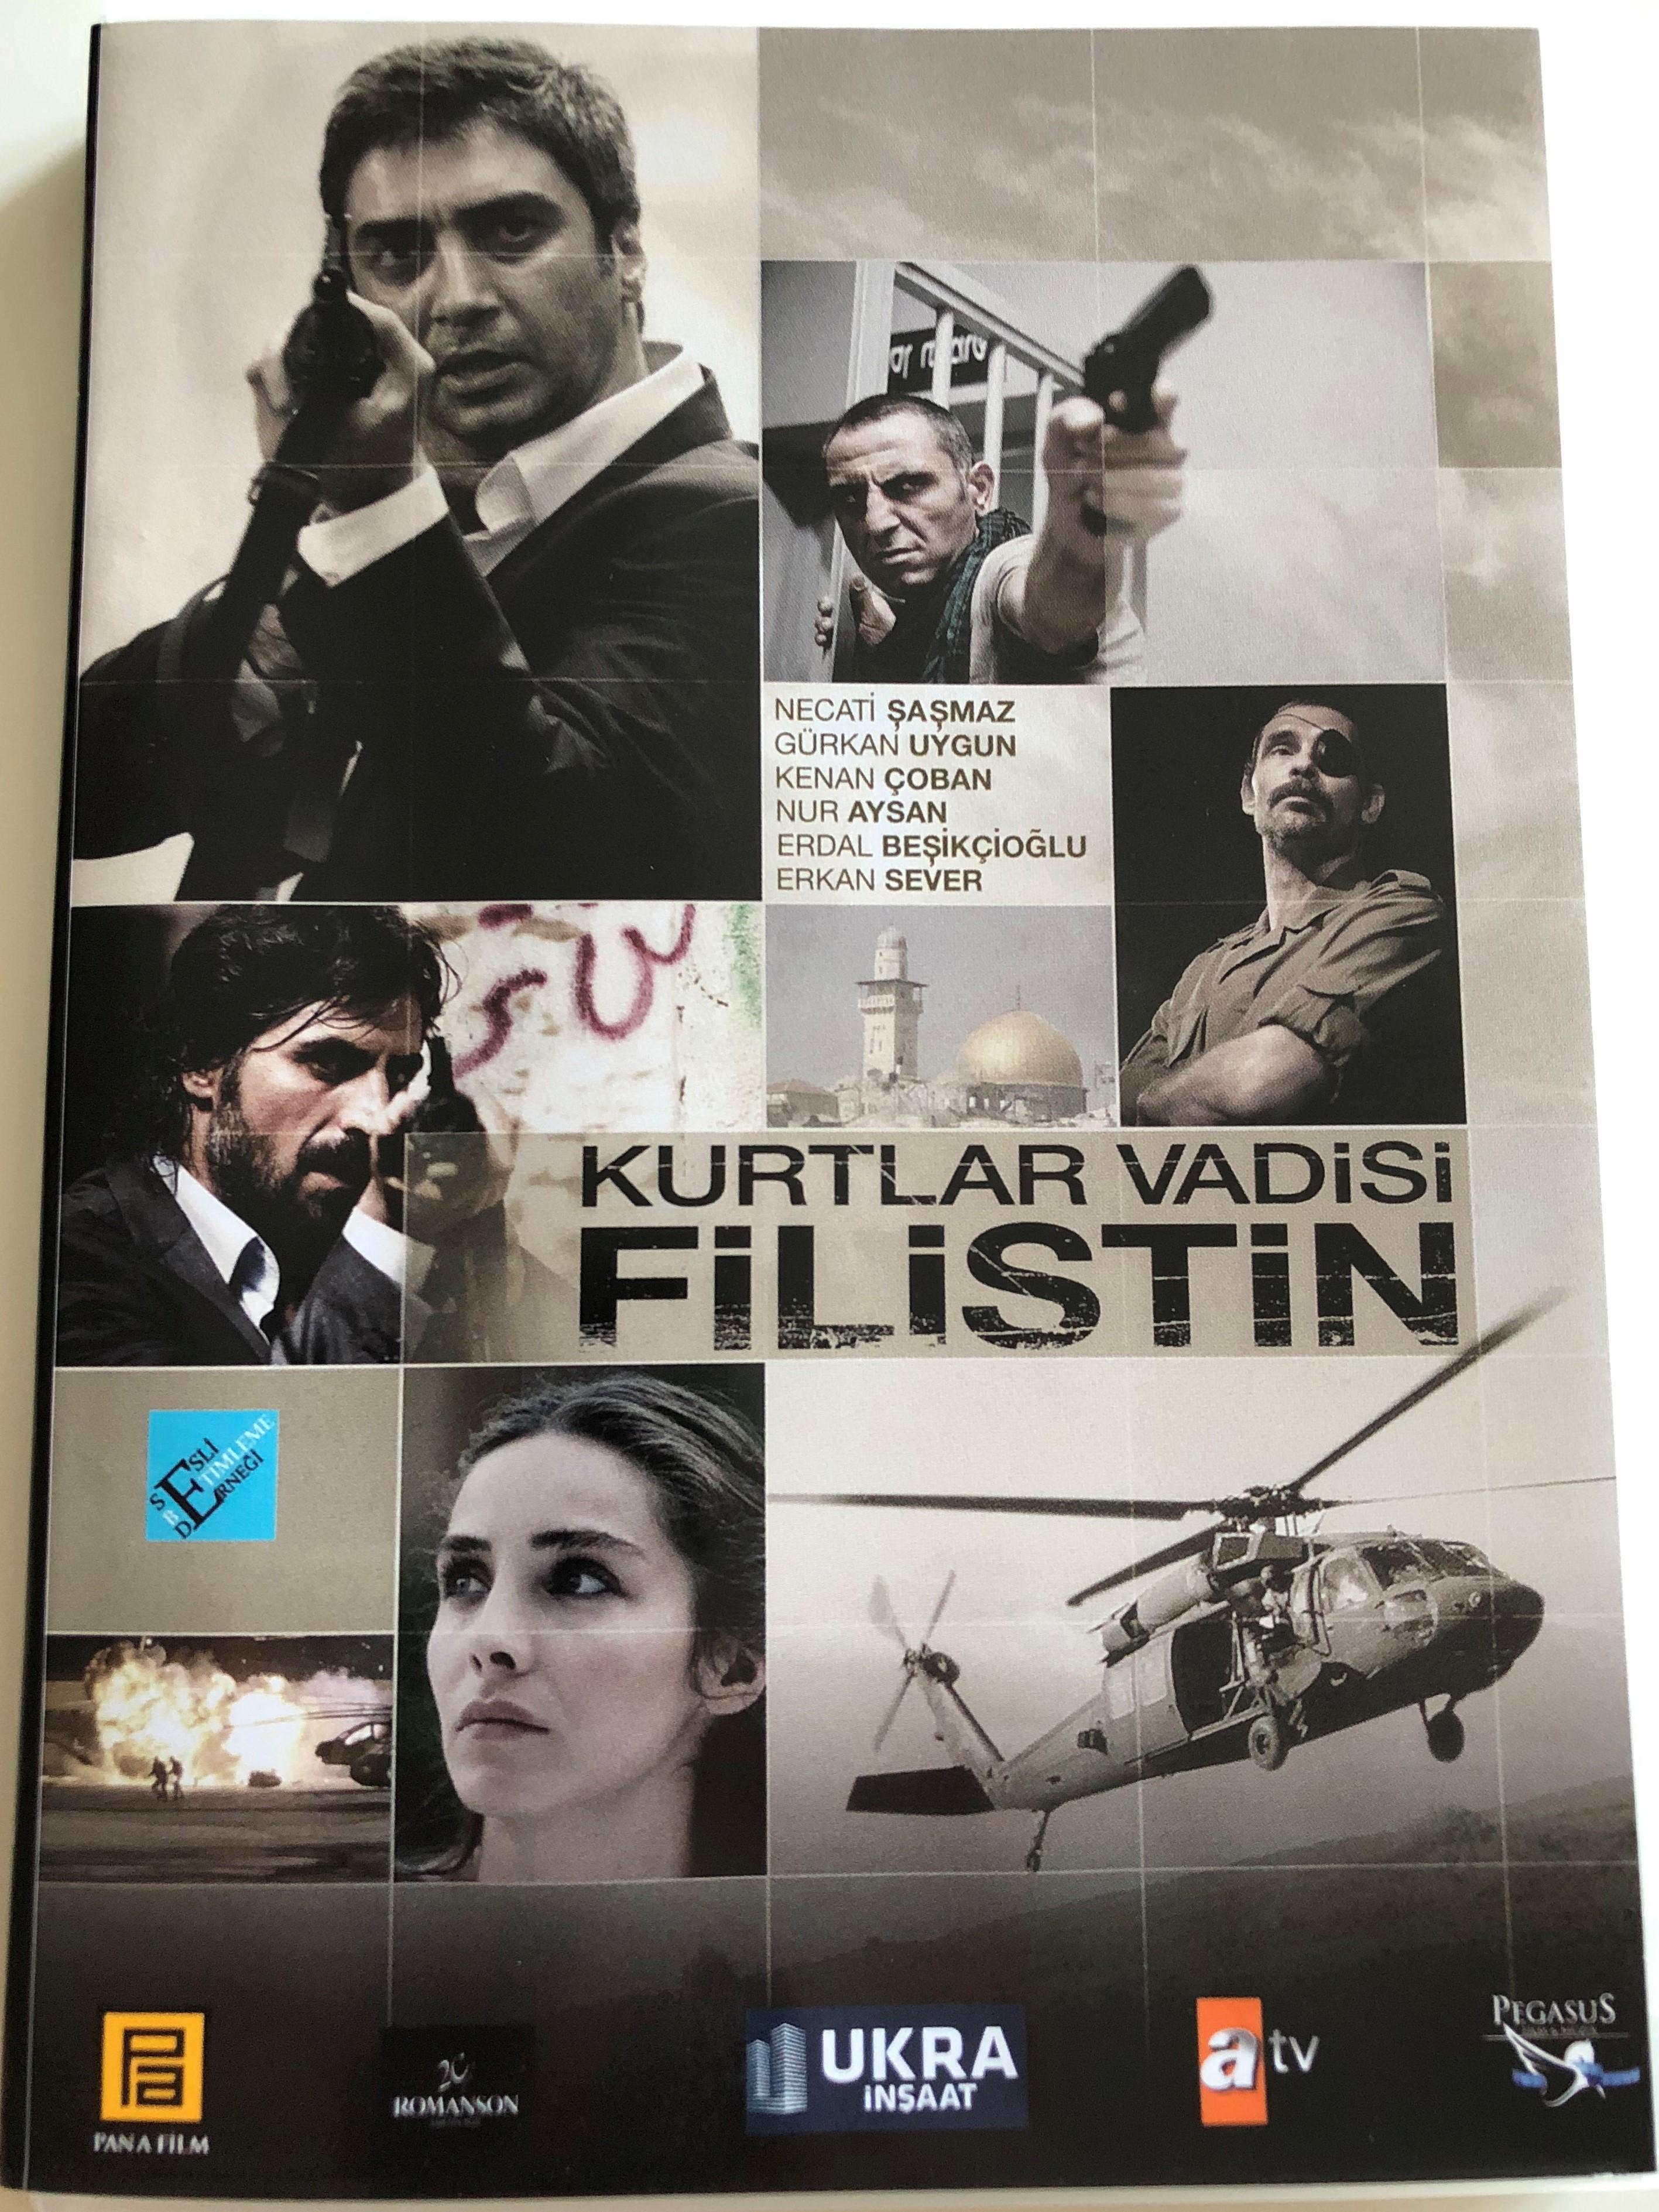 kurtlar-vadisi-filistin-dvd-2011-valley-of-the-wolves-palestine-directed-by-z-beyr-a-maz-starring-necati-a-maz-erdal-be-ik-io-lu-nur-aysan-g-rkan-uygun-kenan-oban-1-.jpg